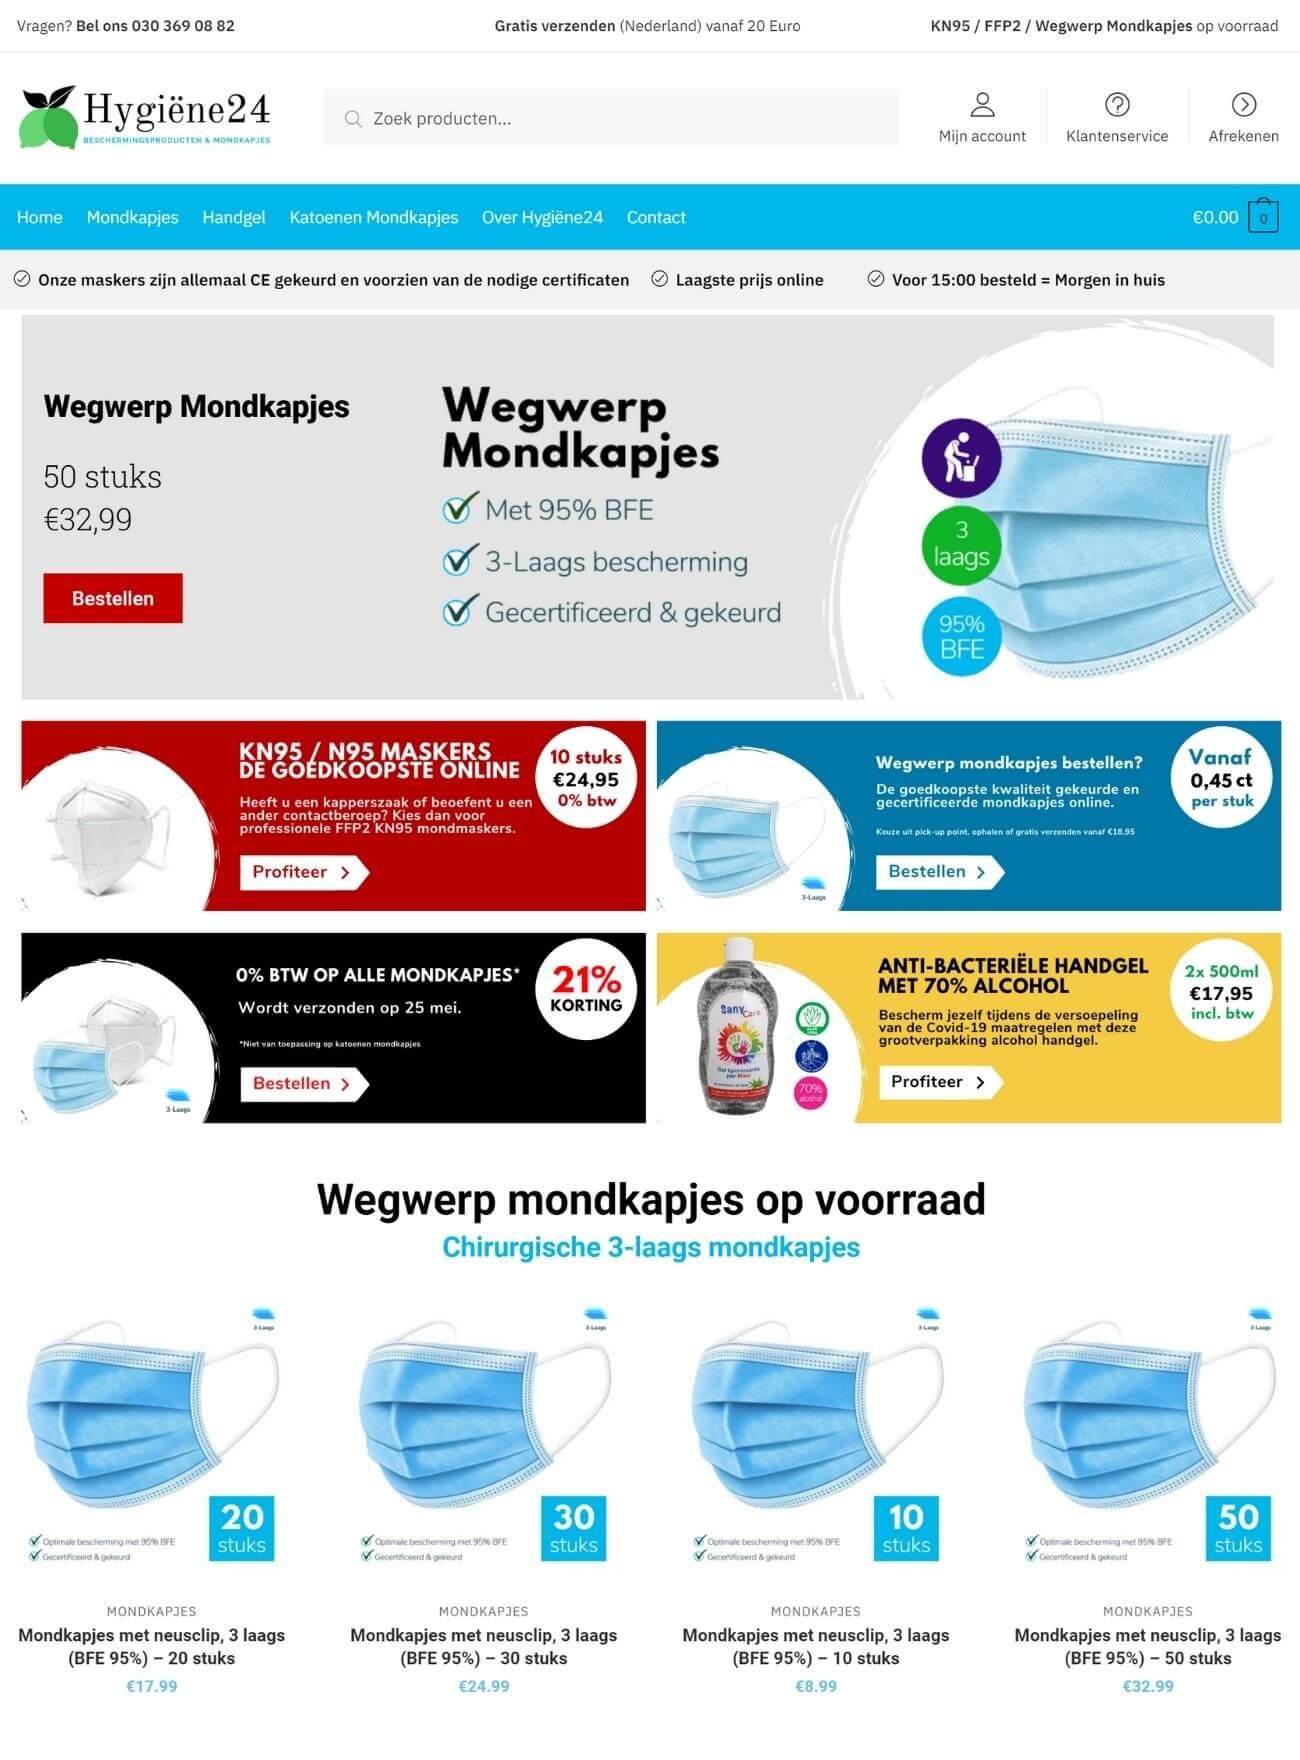 webdesign, SEA en marketing case Hygiëne24